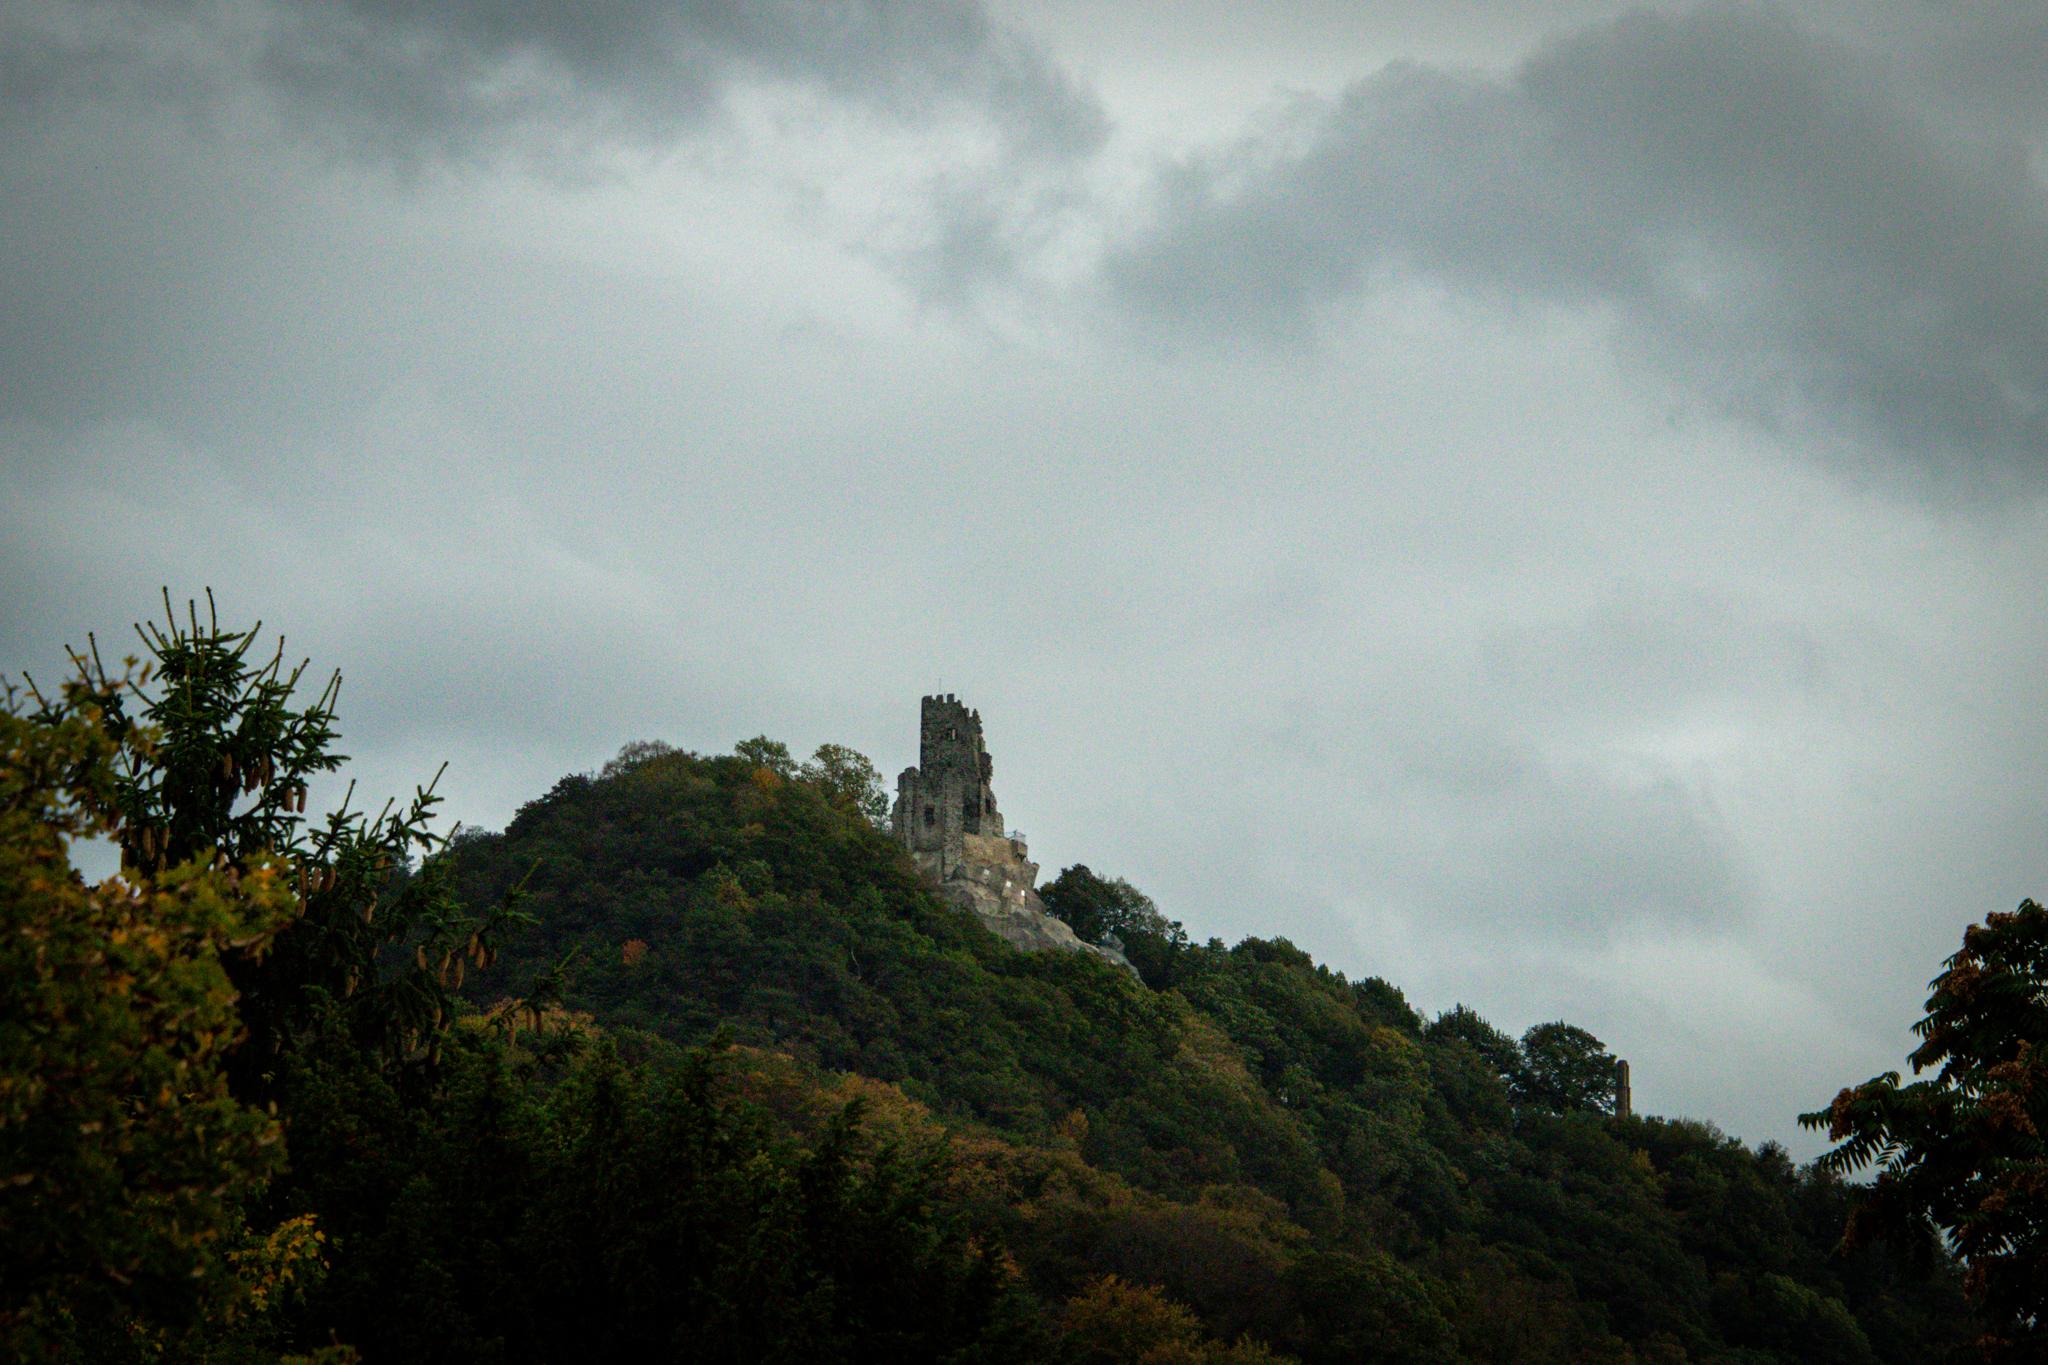 Köngswinter - Drachenfels - Burgruine